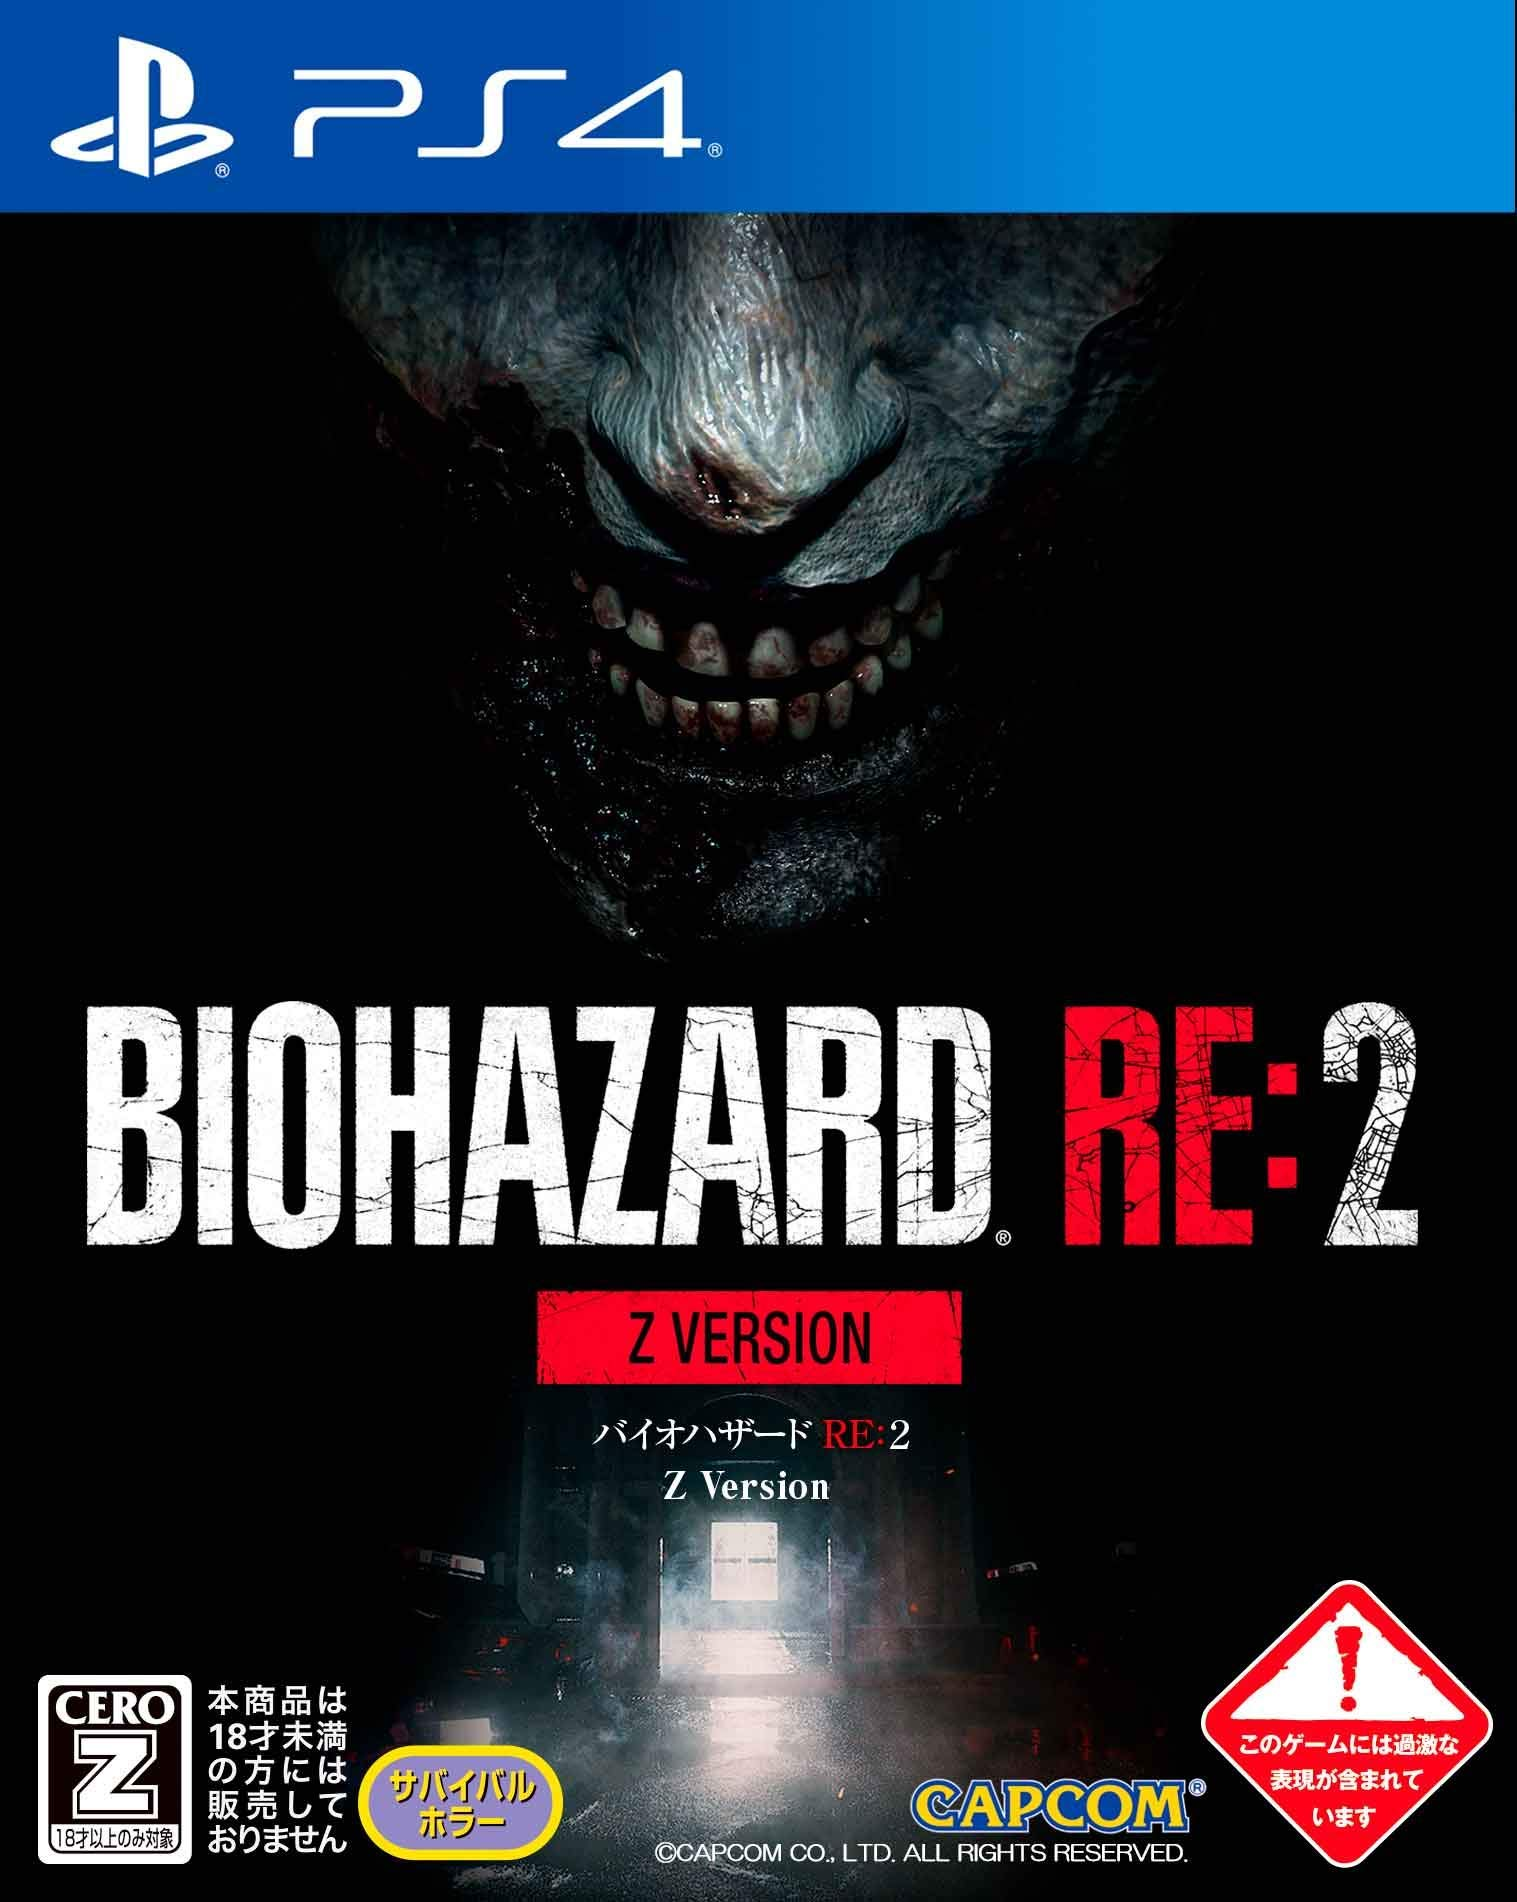 Capcom BioHazard RE 2 Z Version SONY PS4 PLAYSTATION 4 JAPANESE VERSION